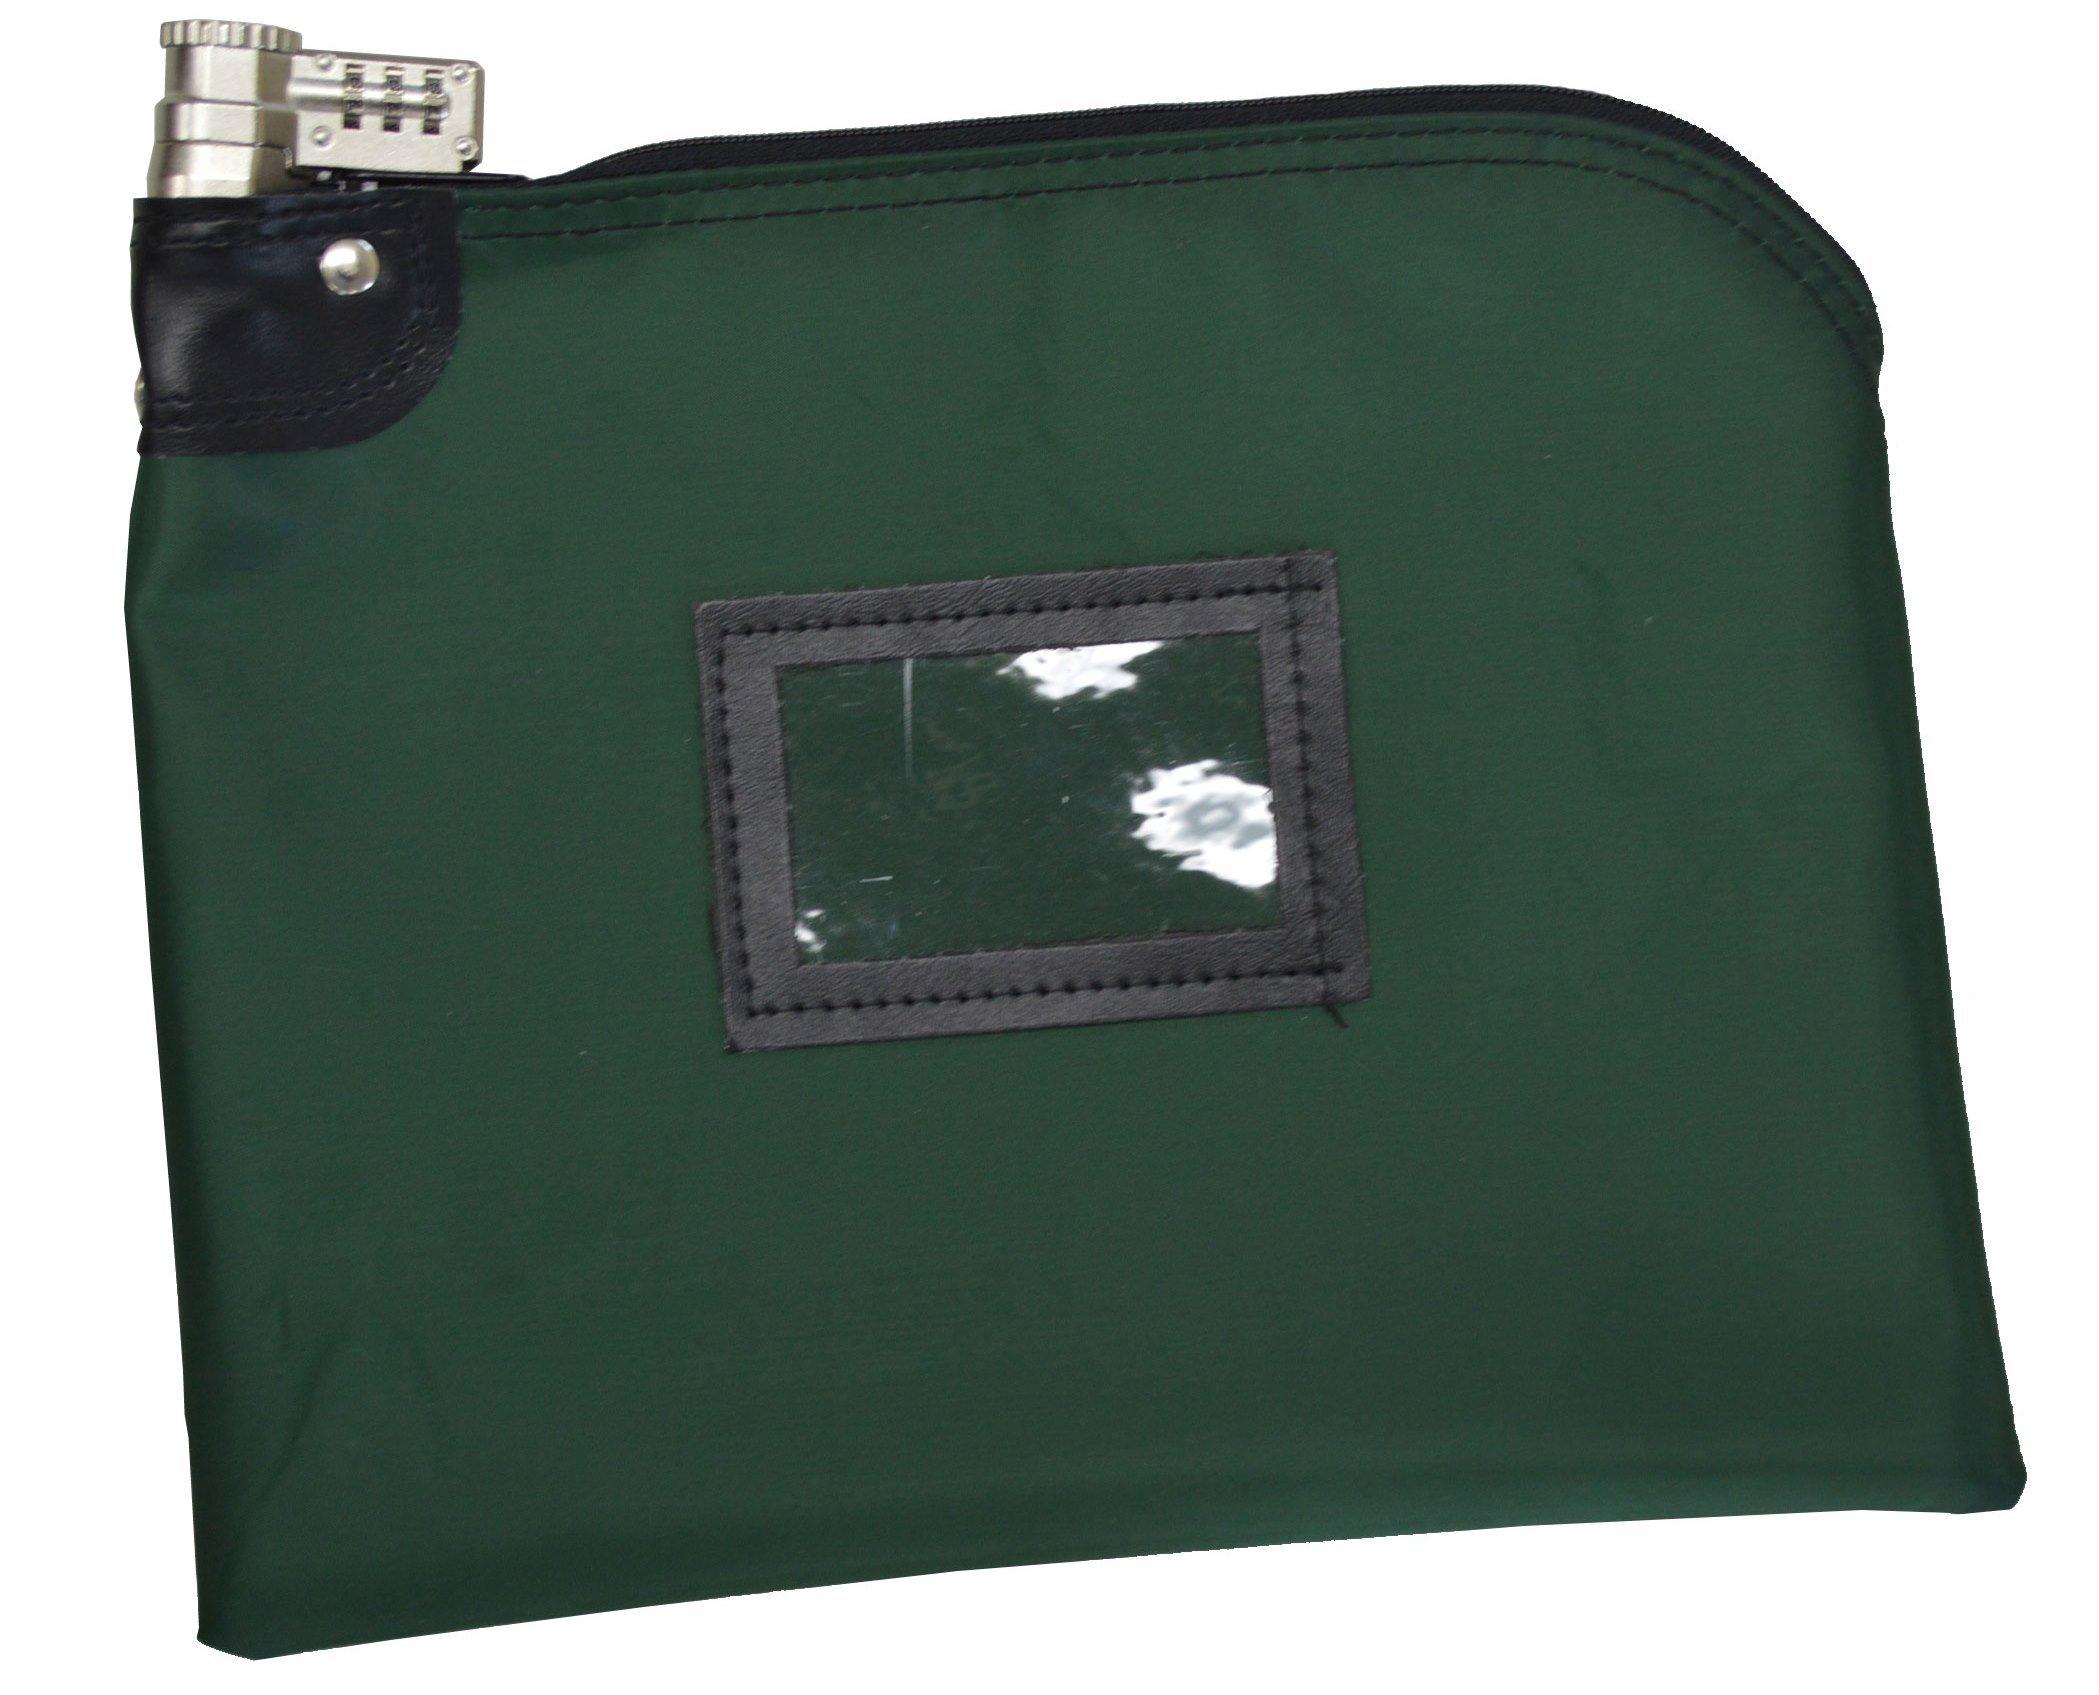 Locking Money Bag Laminated Nylon Combination Keyed Security System Forest Green